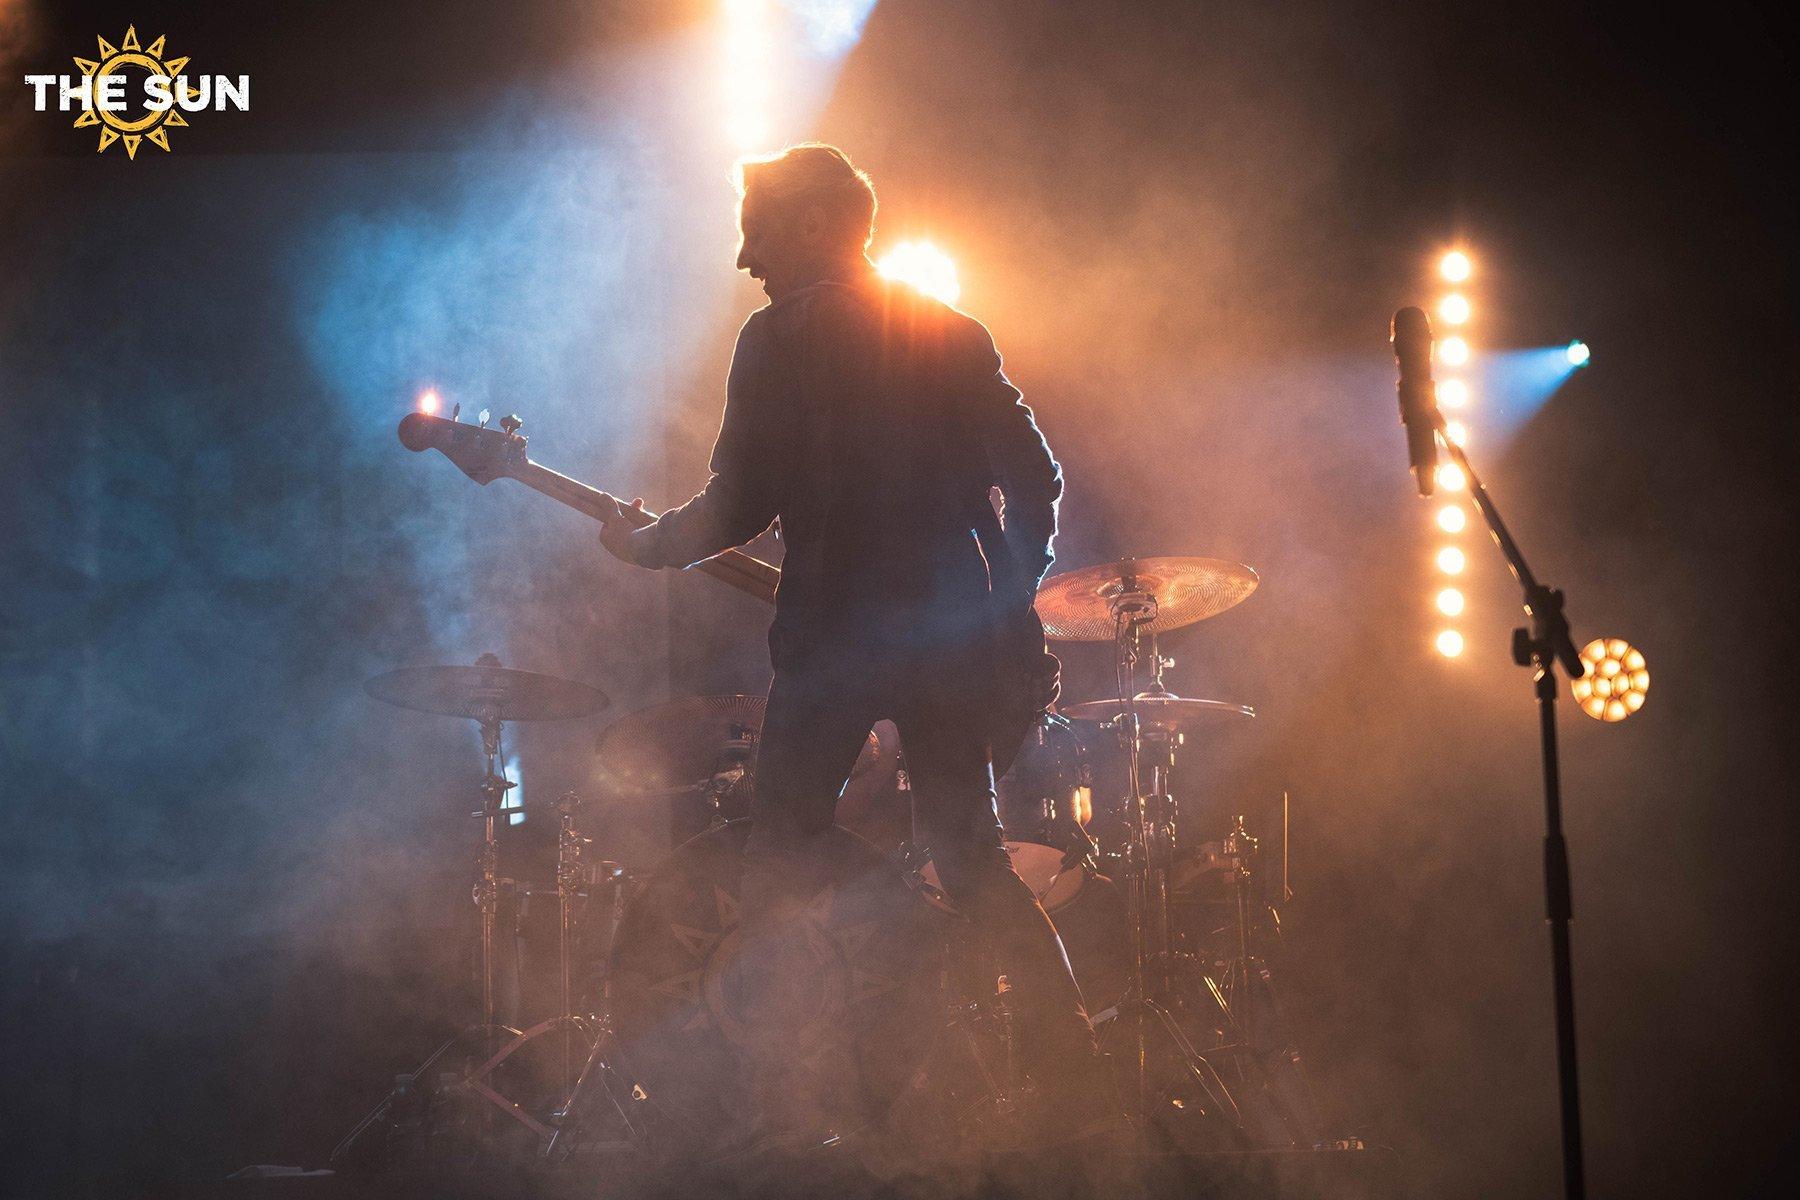 the sun rock band live fascia